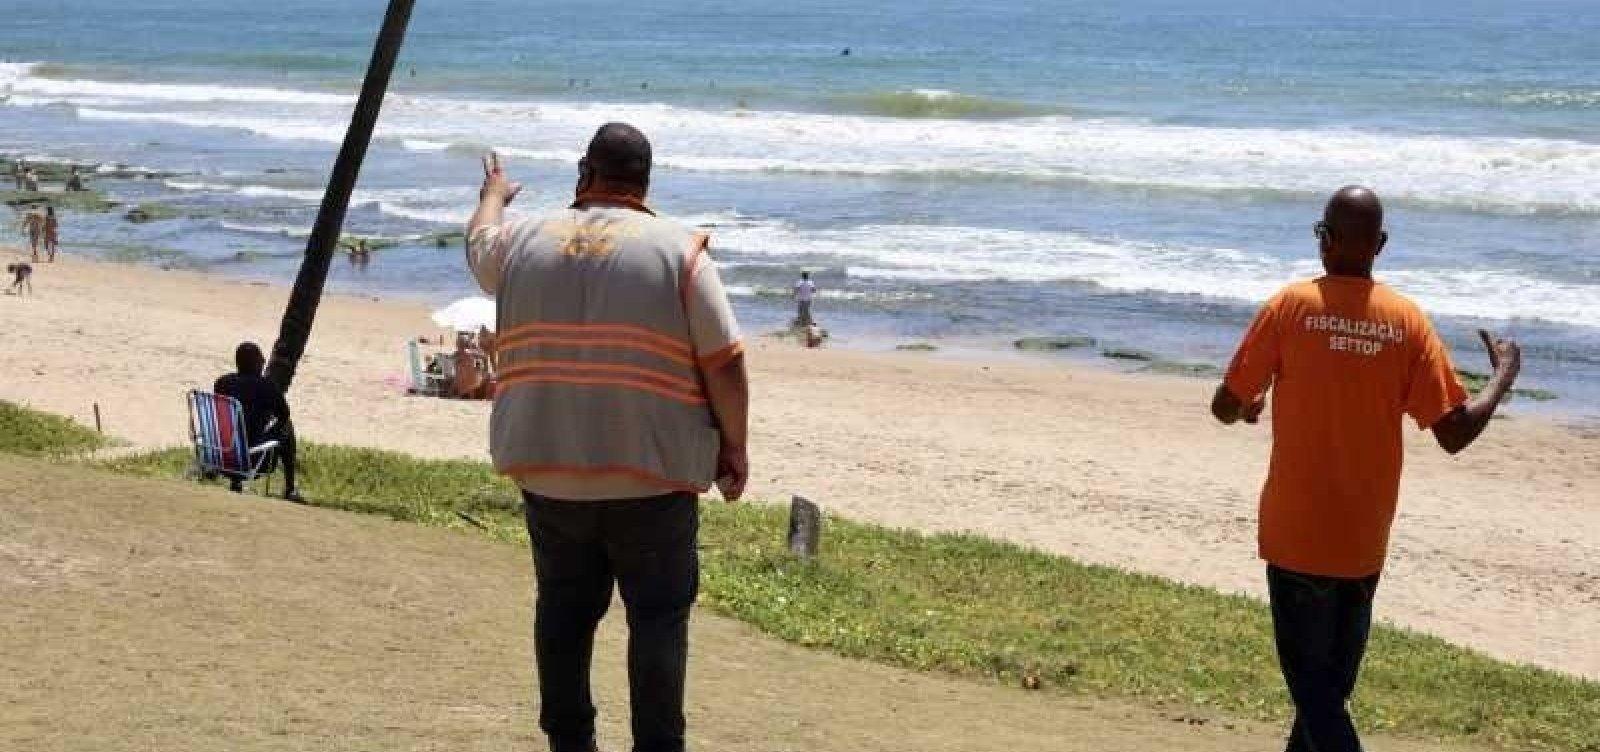 Prefeitura de Lauro de Freitas prorroga decreto que proíbe comércio informal nas praias